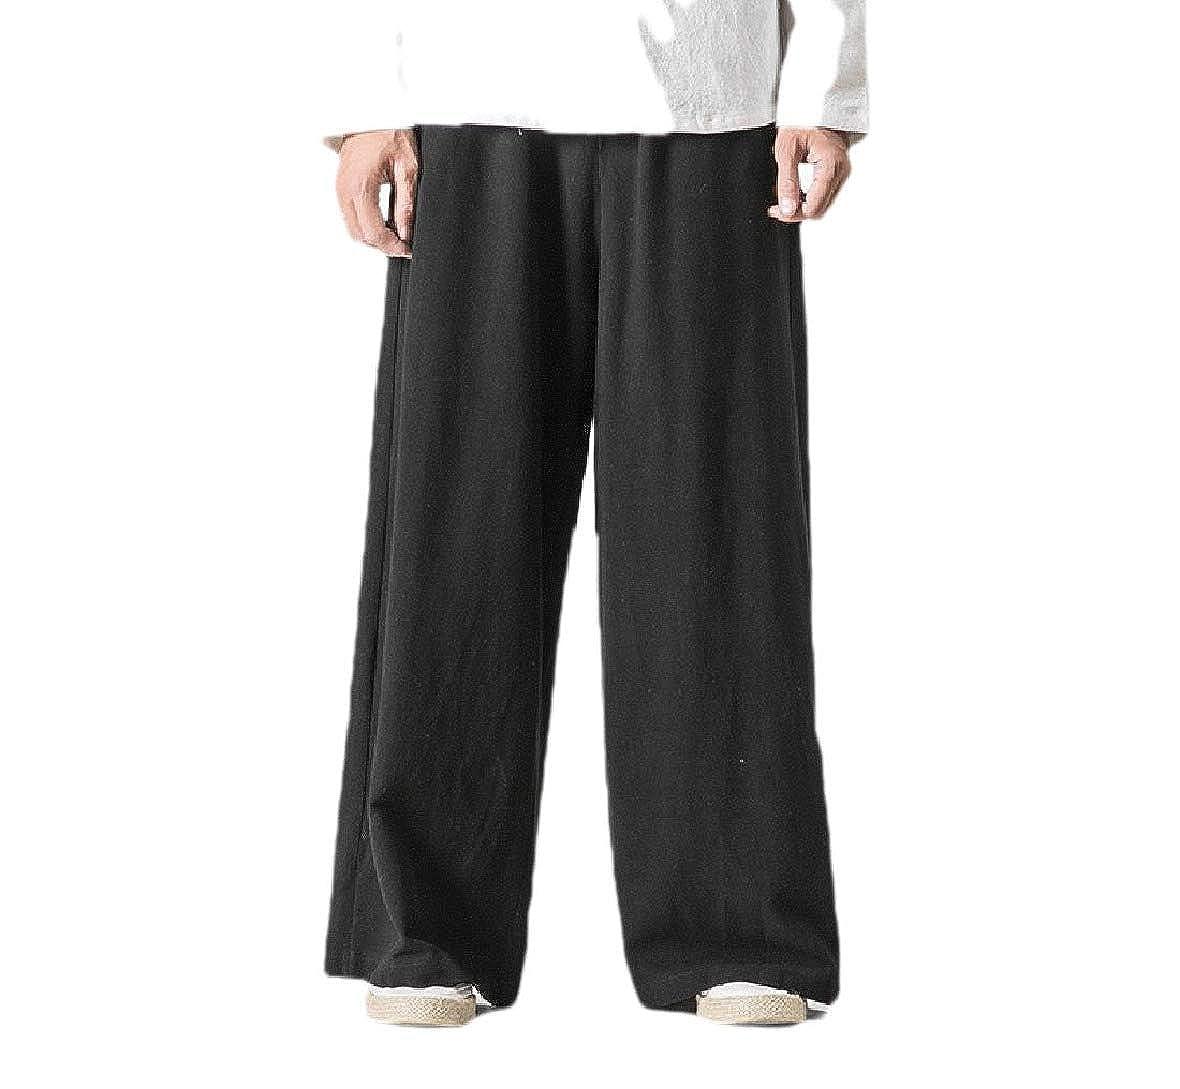 HEFASDM Men Big /& Tall Elastic Waist Straight-Fit Trousers Pull-on Pants